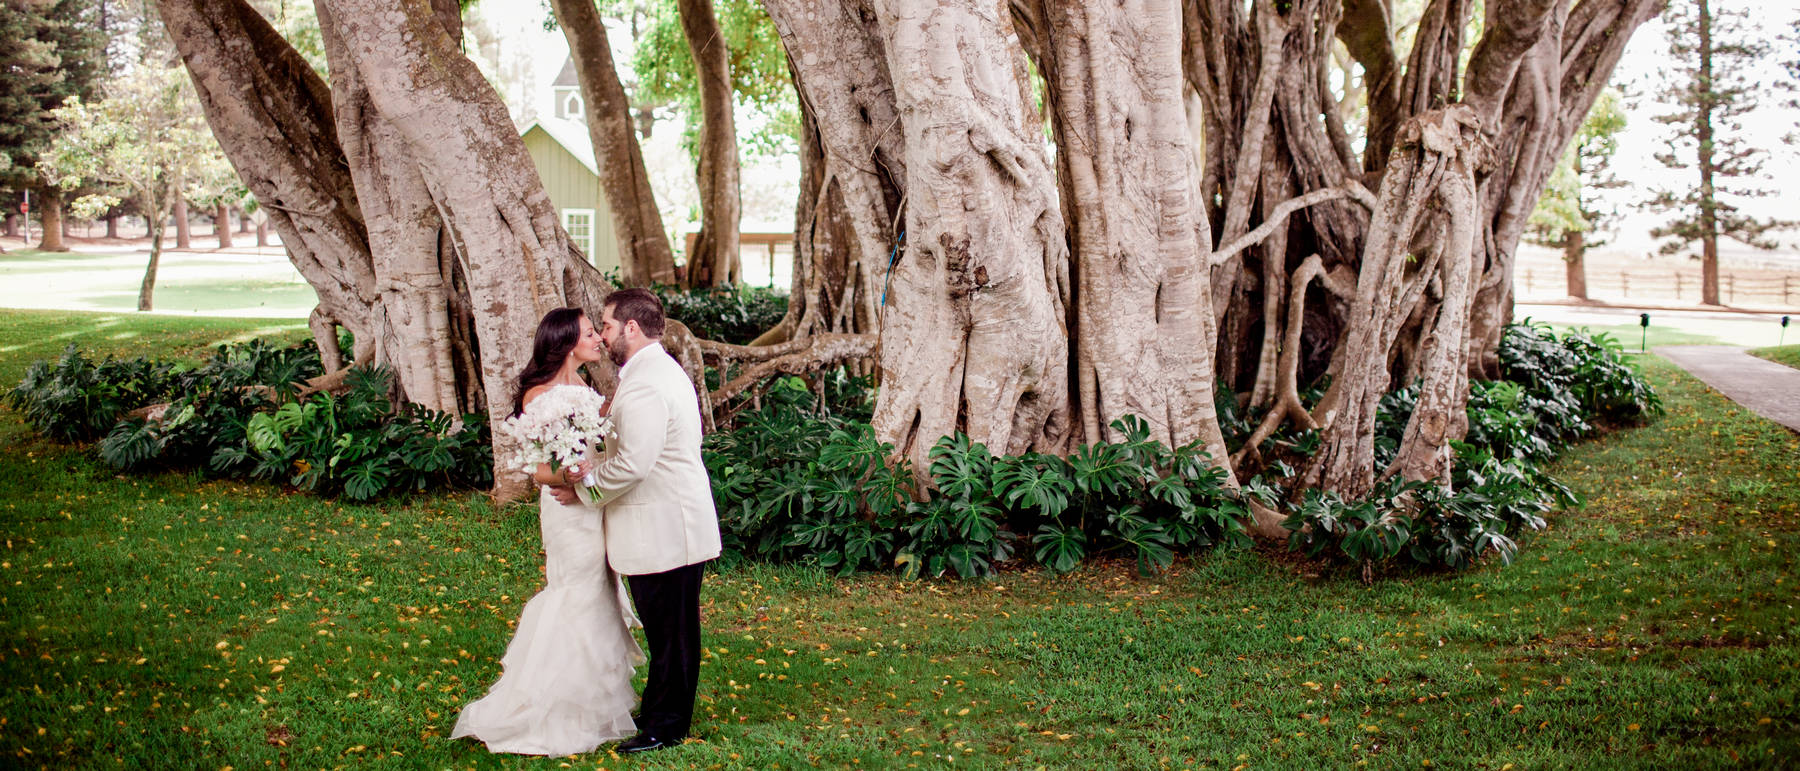 johnandjoseph-wedding-photographer-hz-slider-352